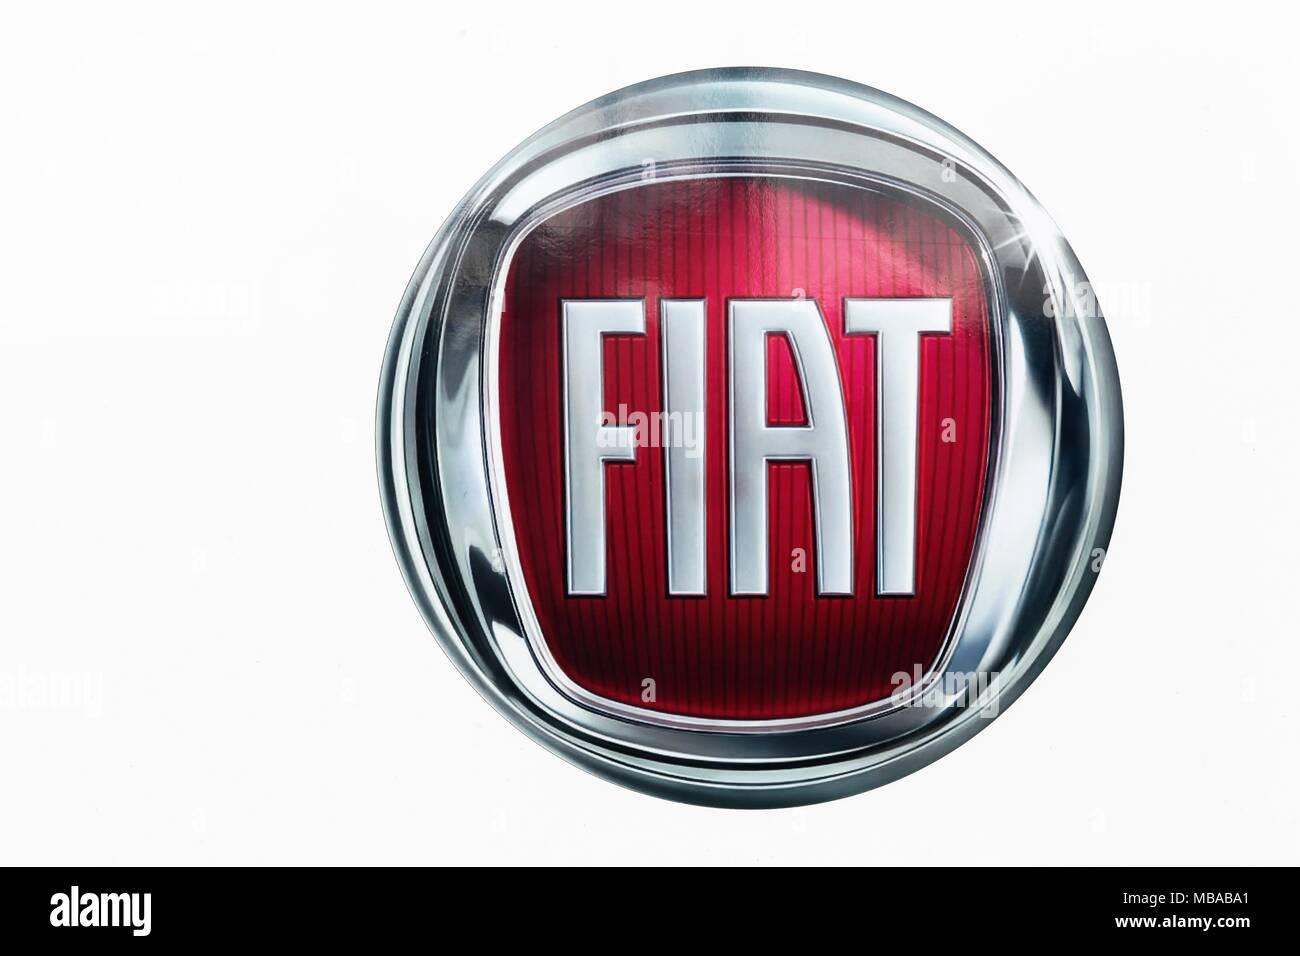 Roskilde, Denmark - September 10, 2017: Fiat logo on a wall. Fiat Chrysler Automobiles is an Italian-American corporation Stock Photo